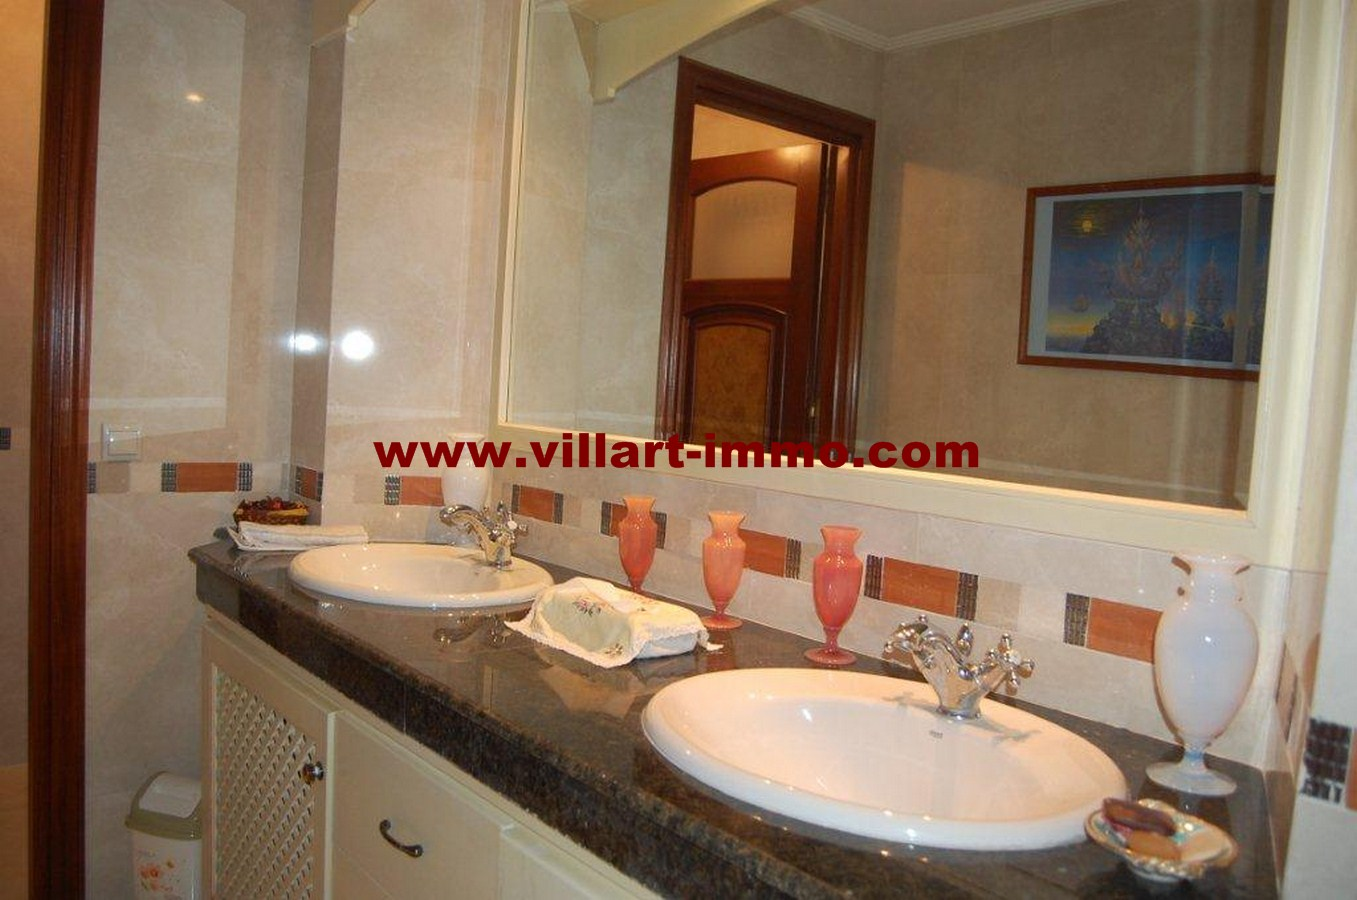 13-vente-appartement-tanger-la-montagne-salle-de-bain-3-va452-villart-immo